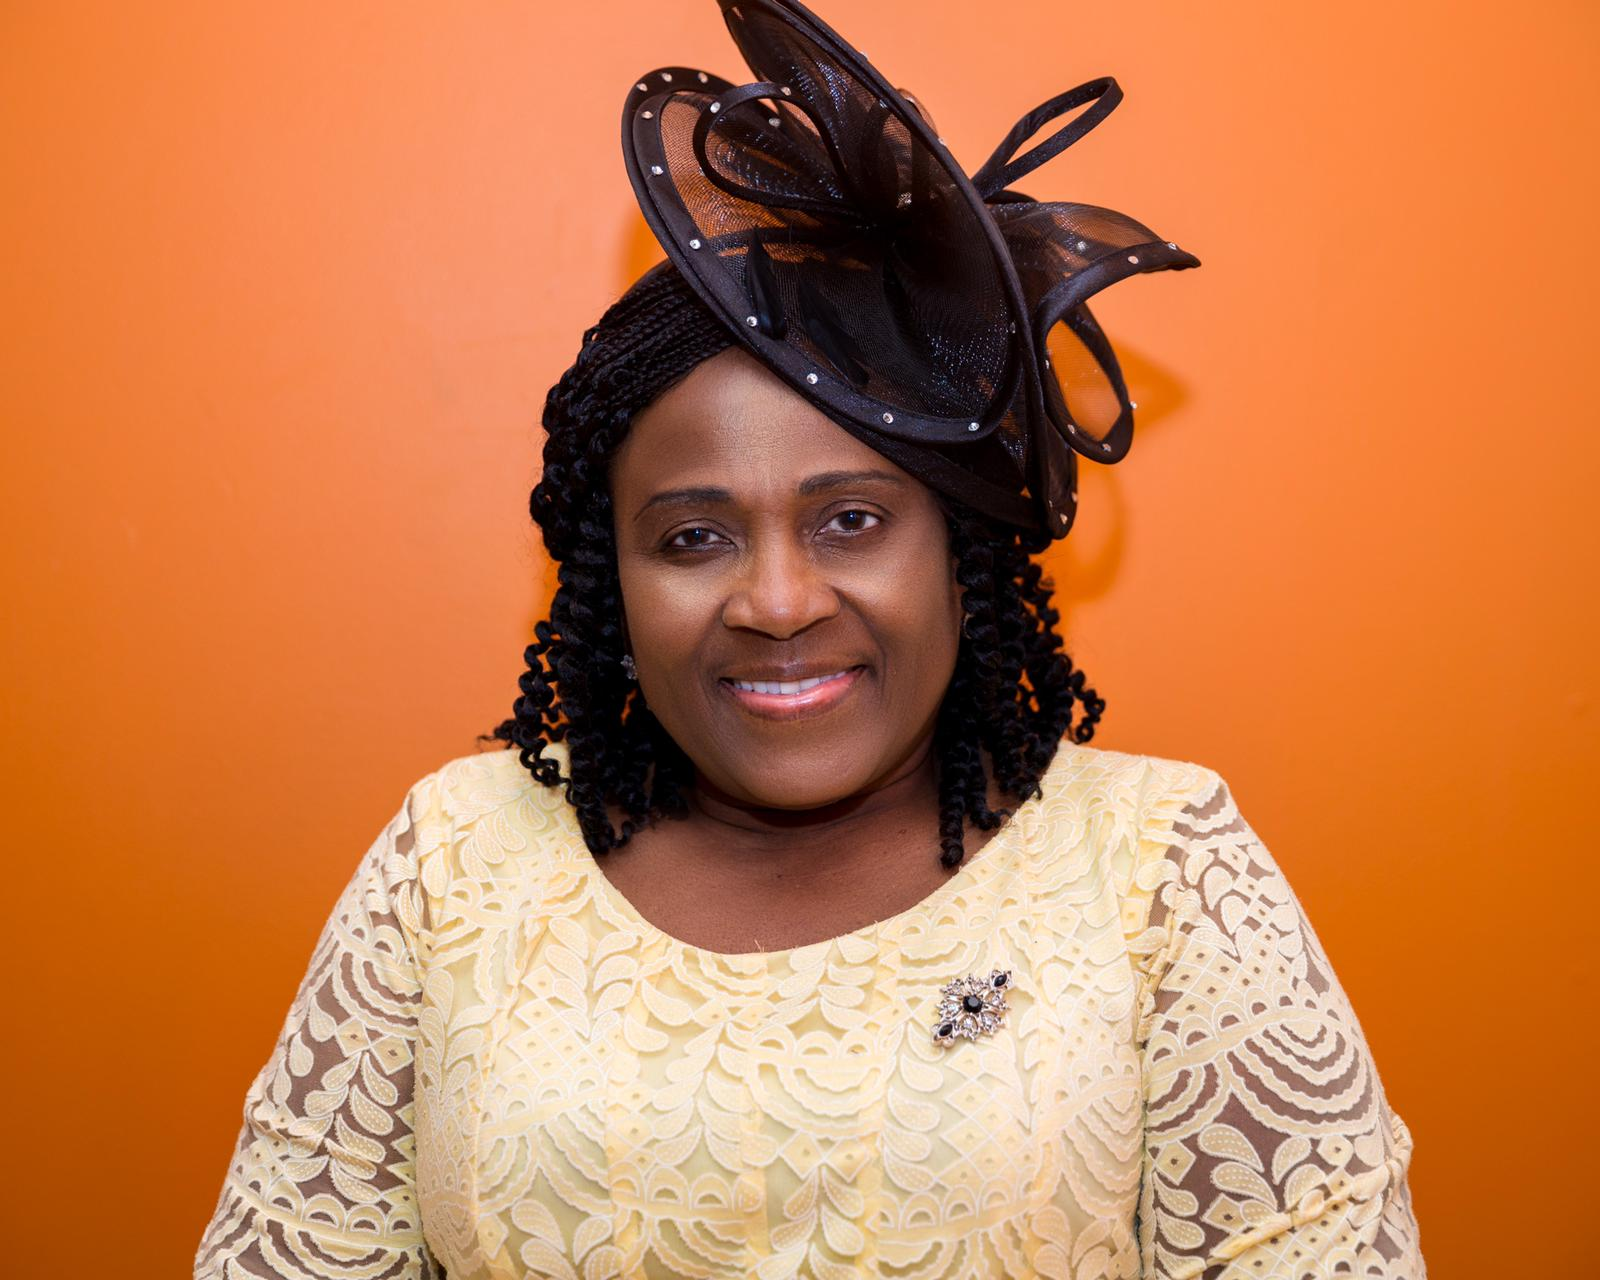 Pastor Georgeline Ogbu